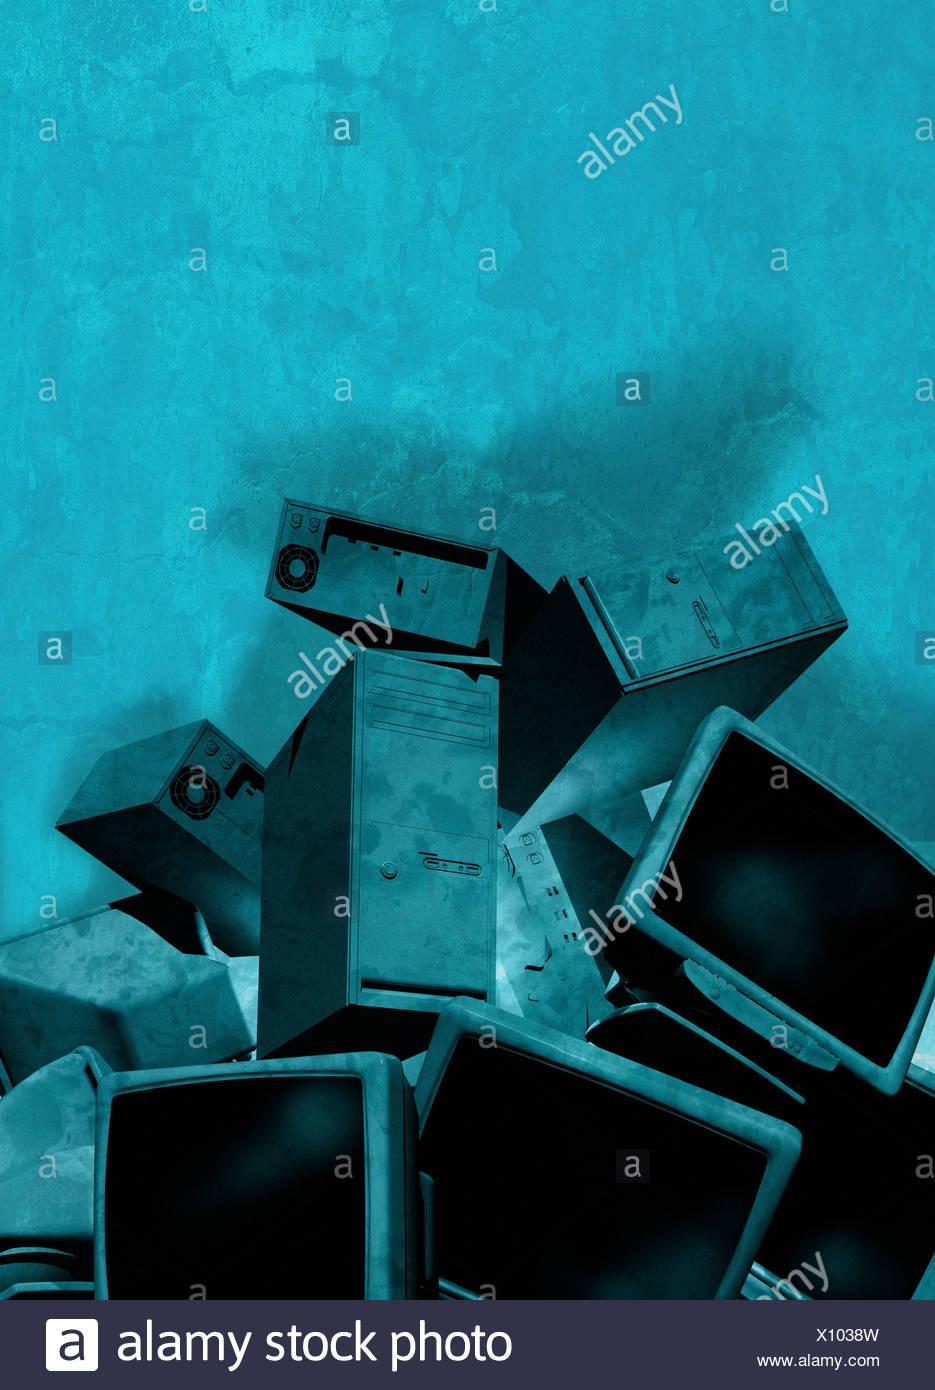 Obsolete technology, artwork - Stock Image